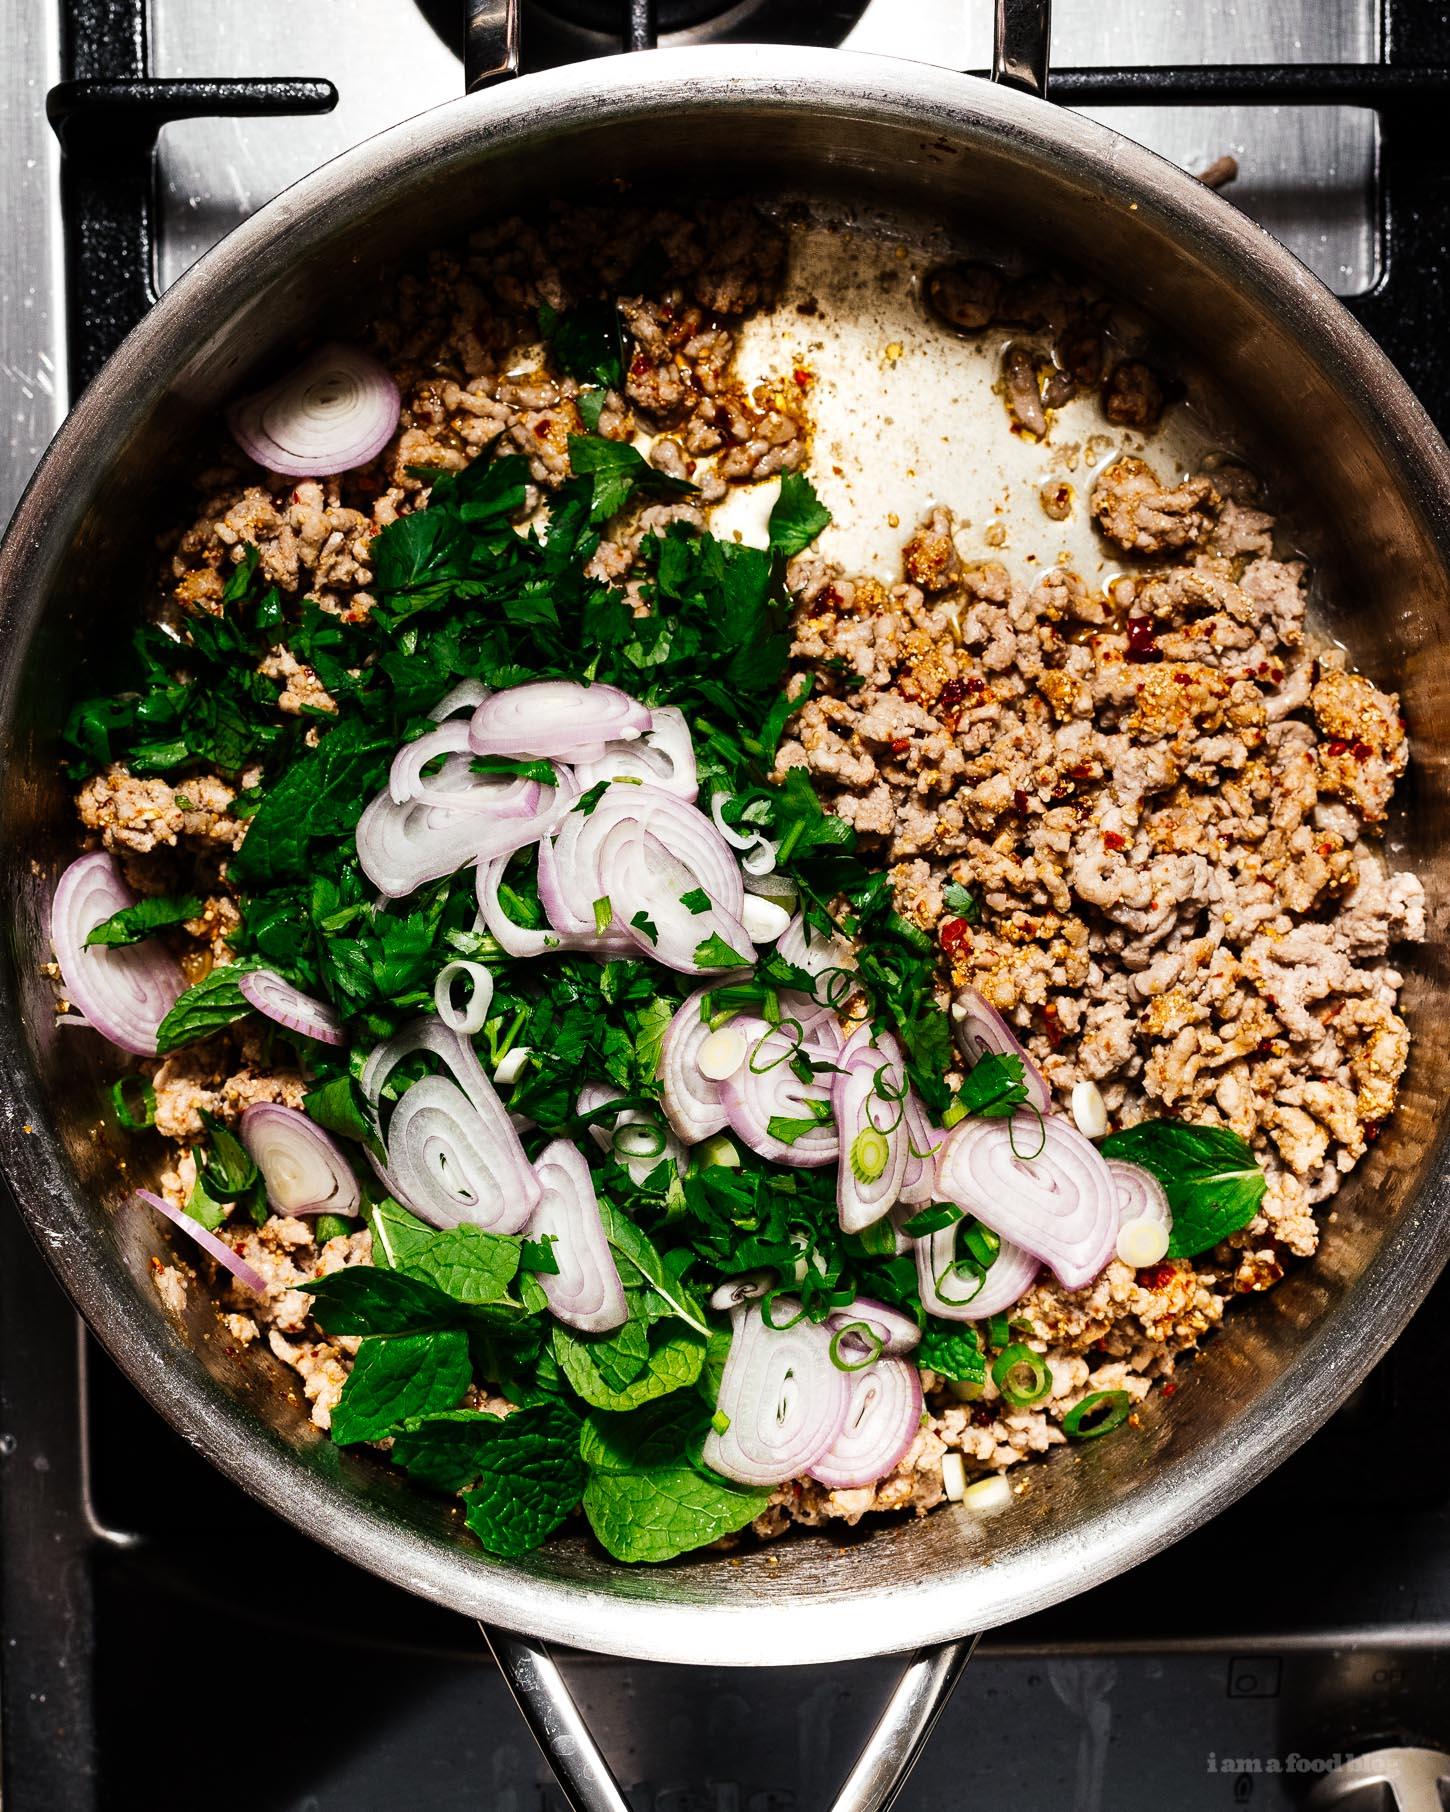 Larb Moo Pork Larb Recipe - Thai Pork Salad | www.iamafoodblog.com